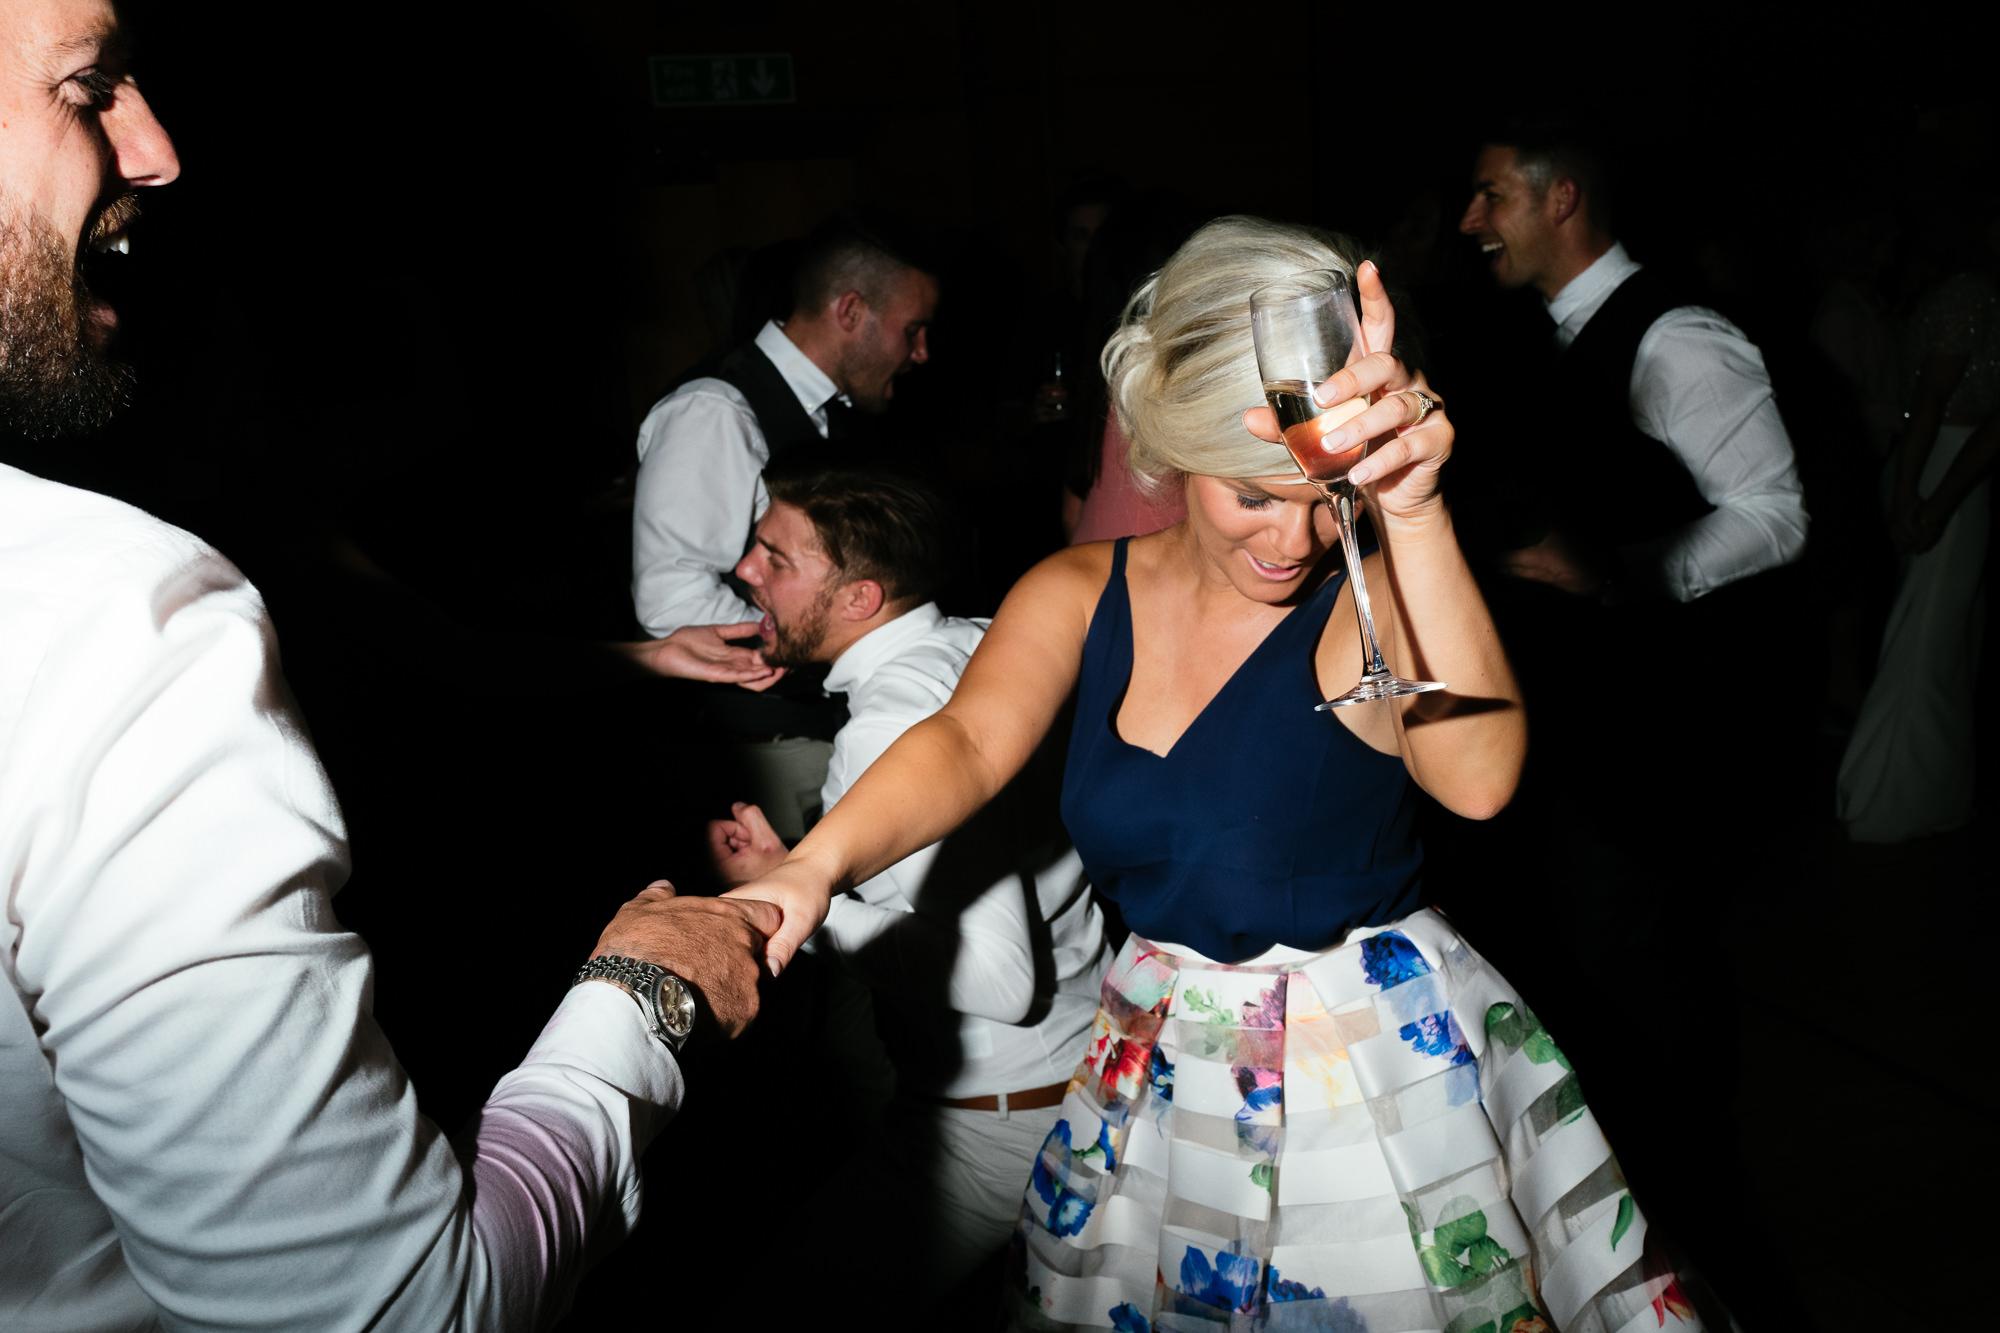 town-hall-hotel-london-wedding-107